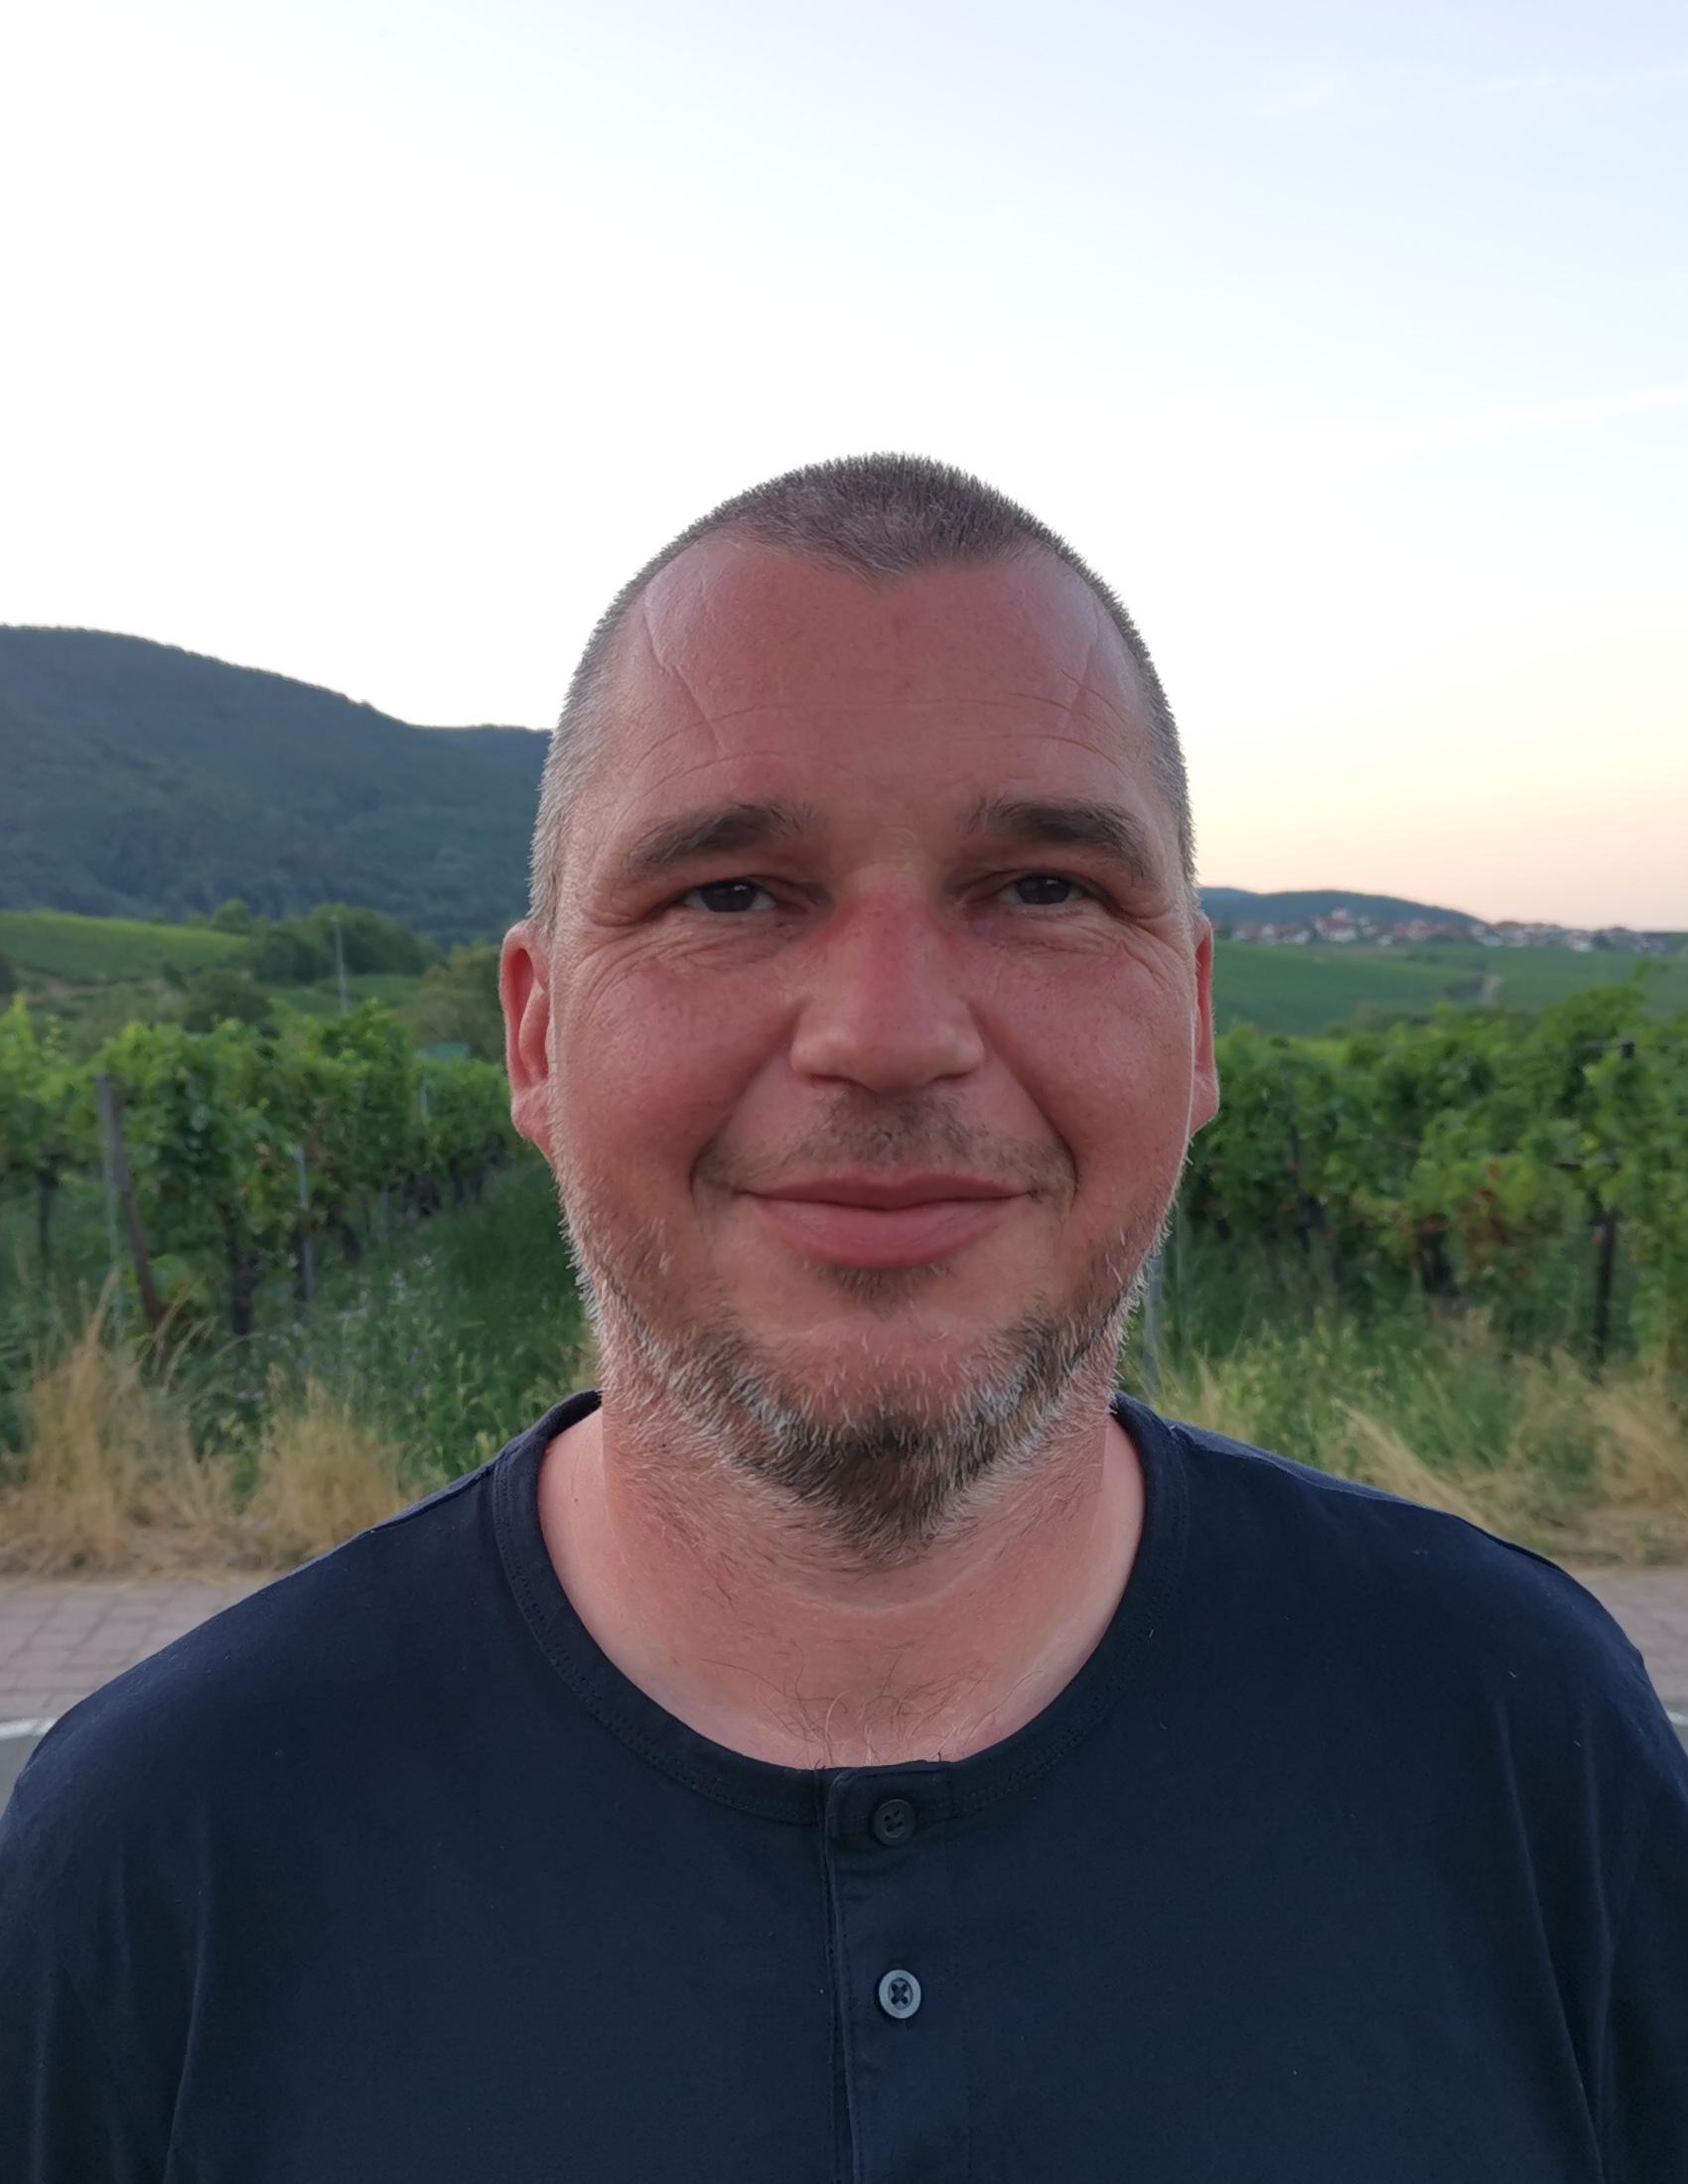 Mike Hemberger